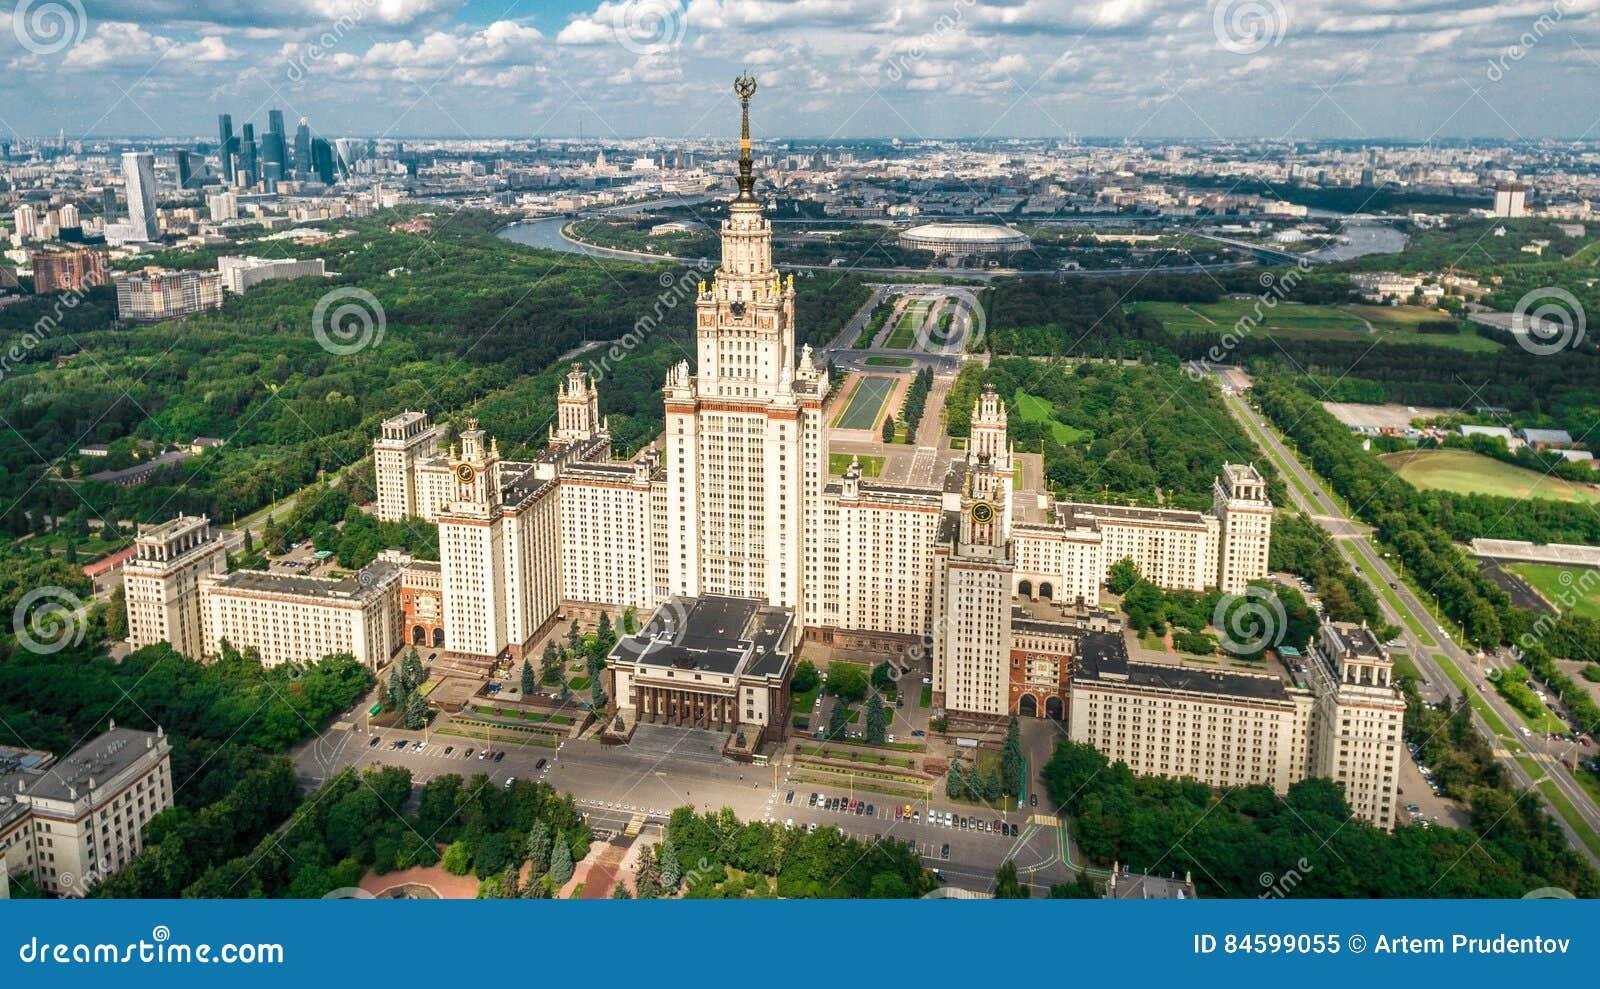 Lomonosov Moskwa stanu uniwersyteta widok z lotu ptaka